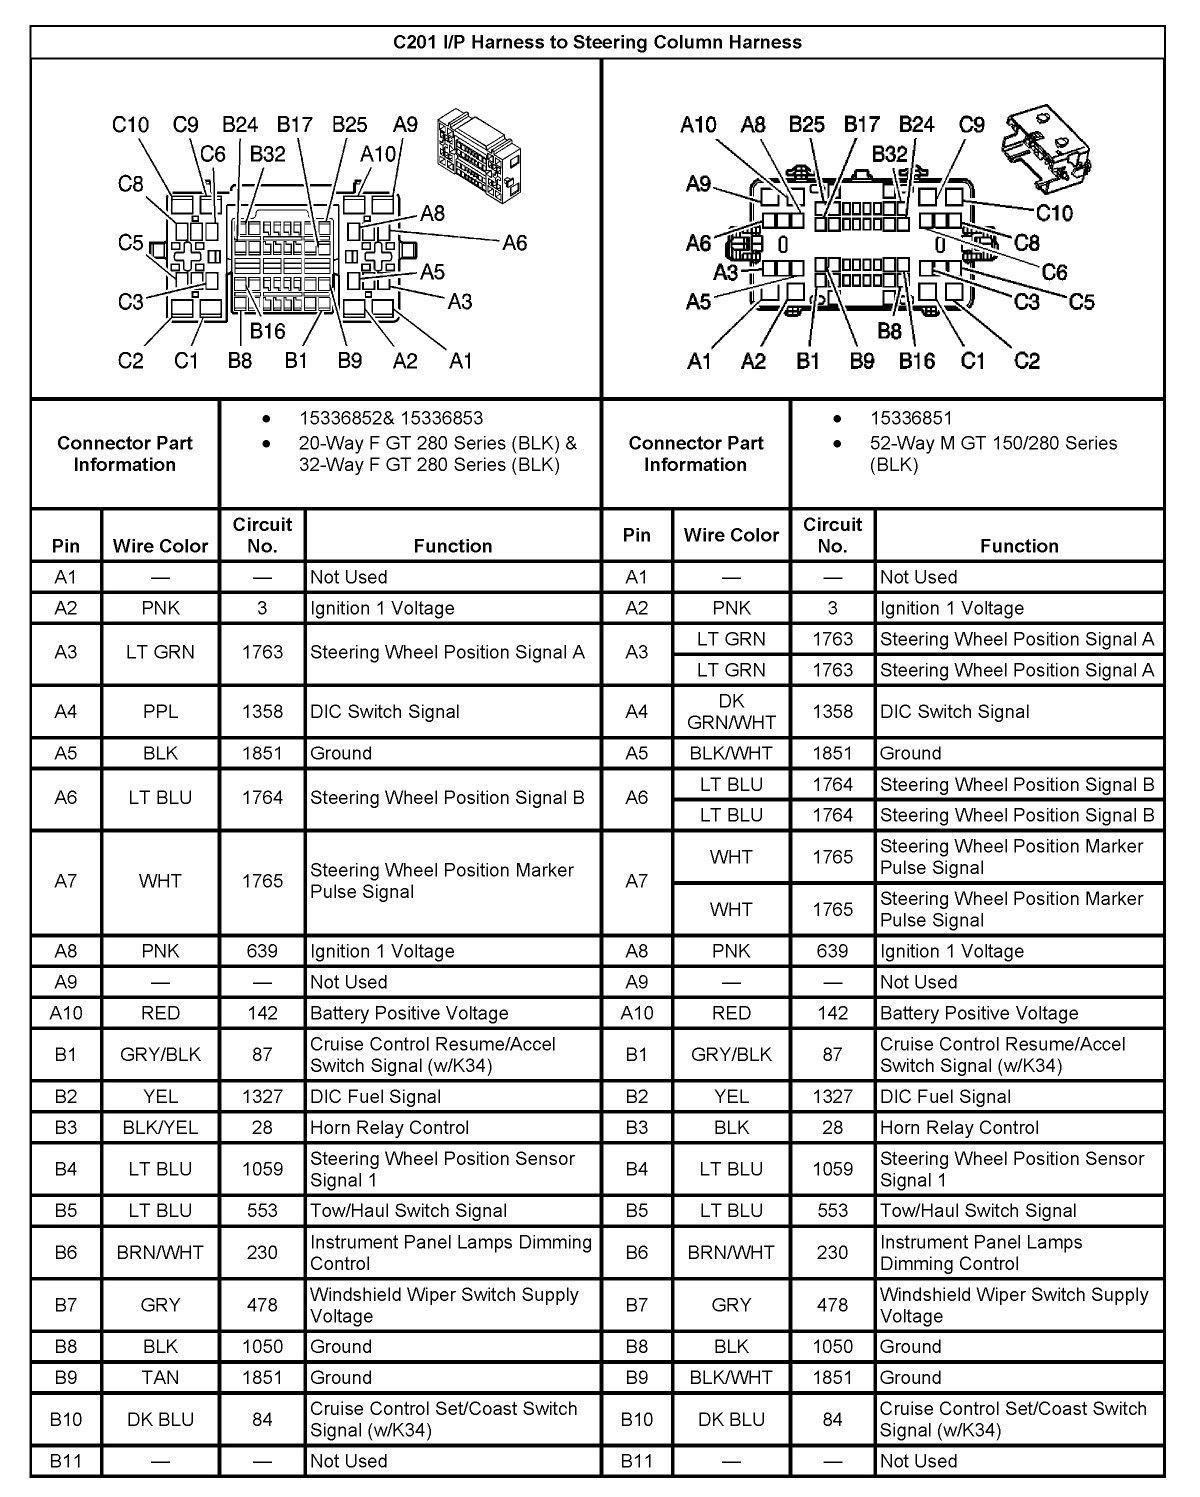 2009 Trailblazer Stereo Wiring Enthusiast Wiring Diagrams Gmc Yukon Chevy Silverado Truck Stereo